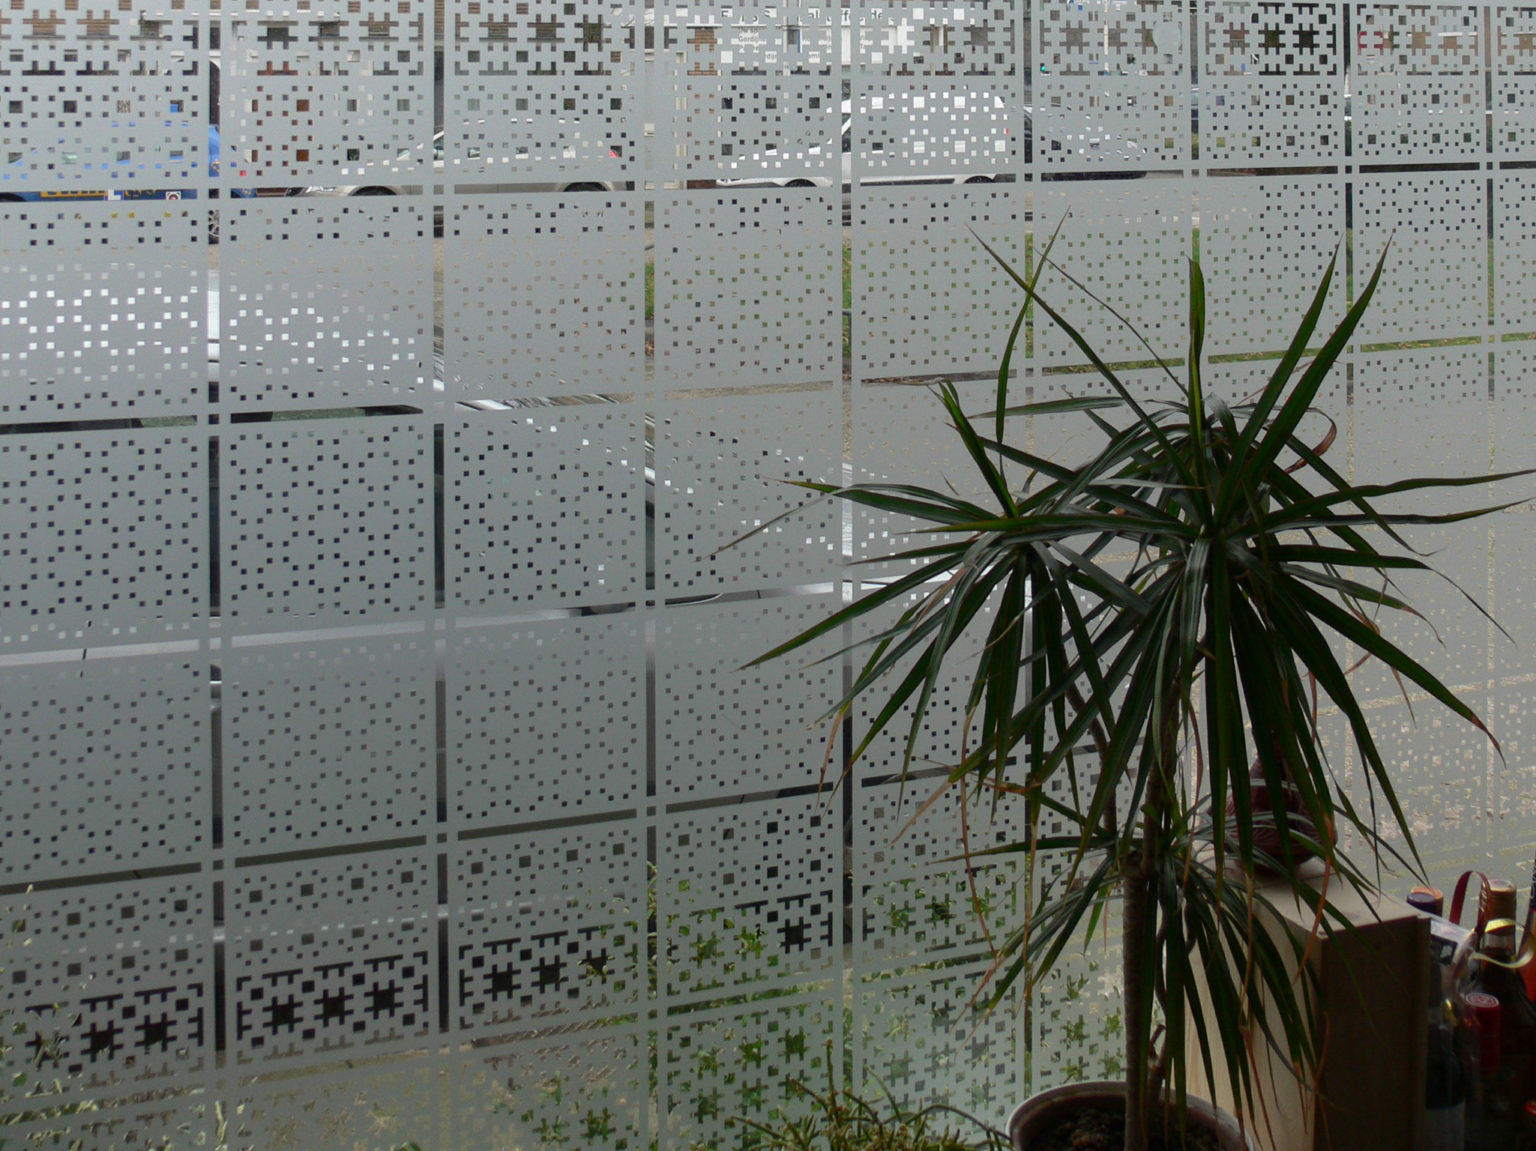 raamfolie patroon/Schutspatroon op keukenraam van binnenuit gezien 3